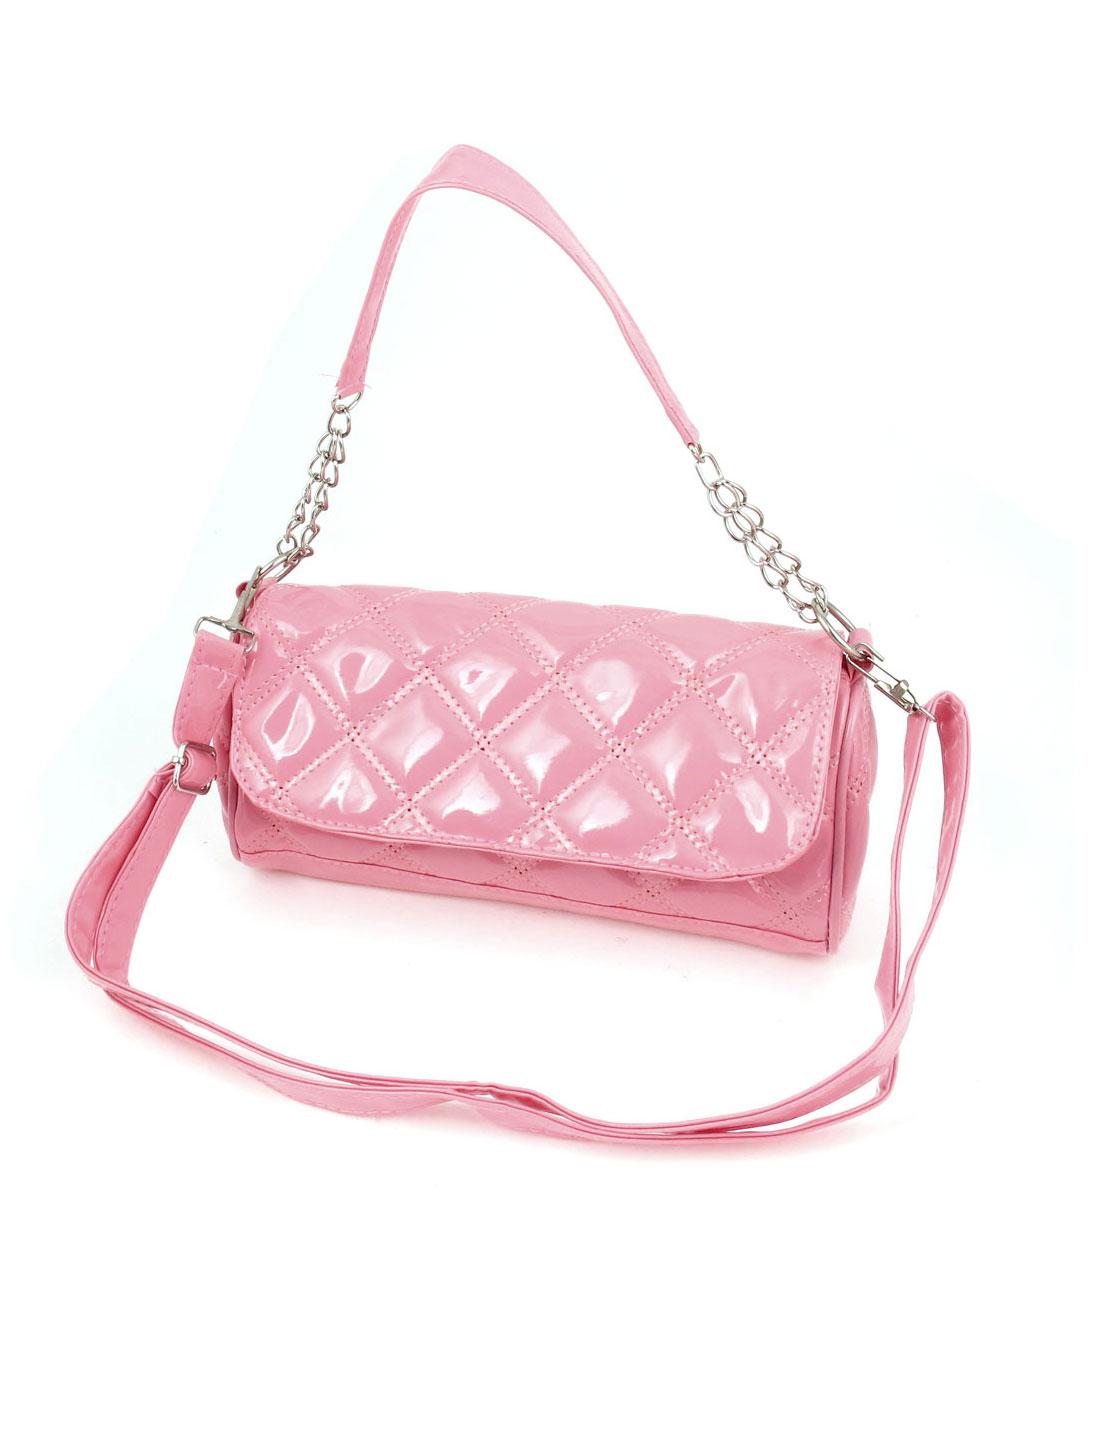 Ladies Faux Leather Metal Chain Zipper Closure Shoulder Bag Handbag Pink